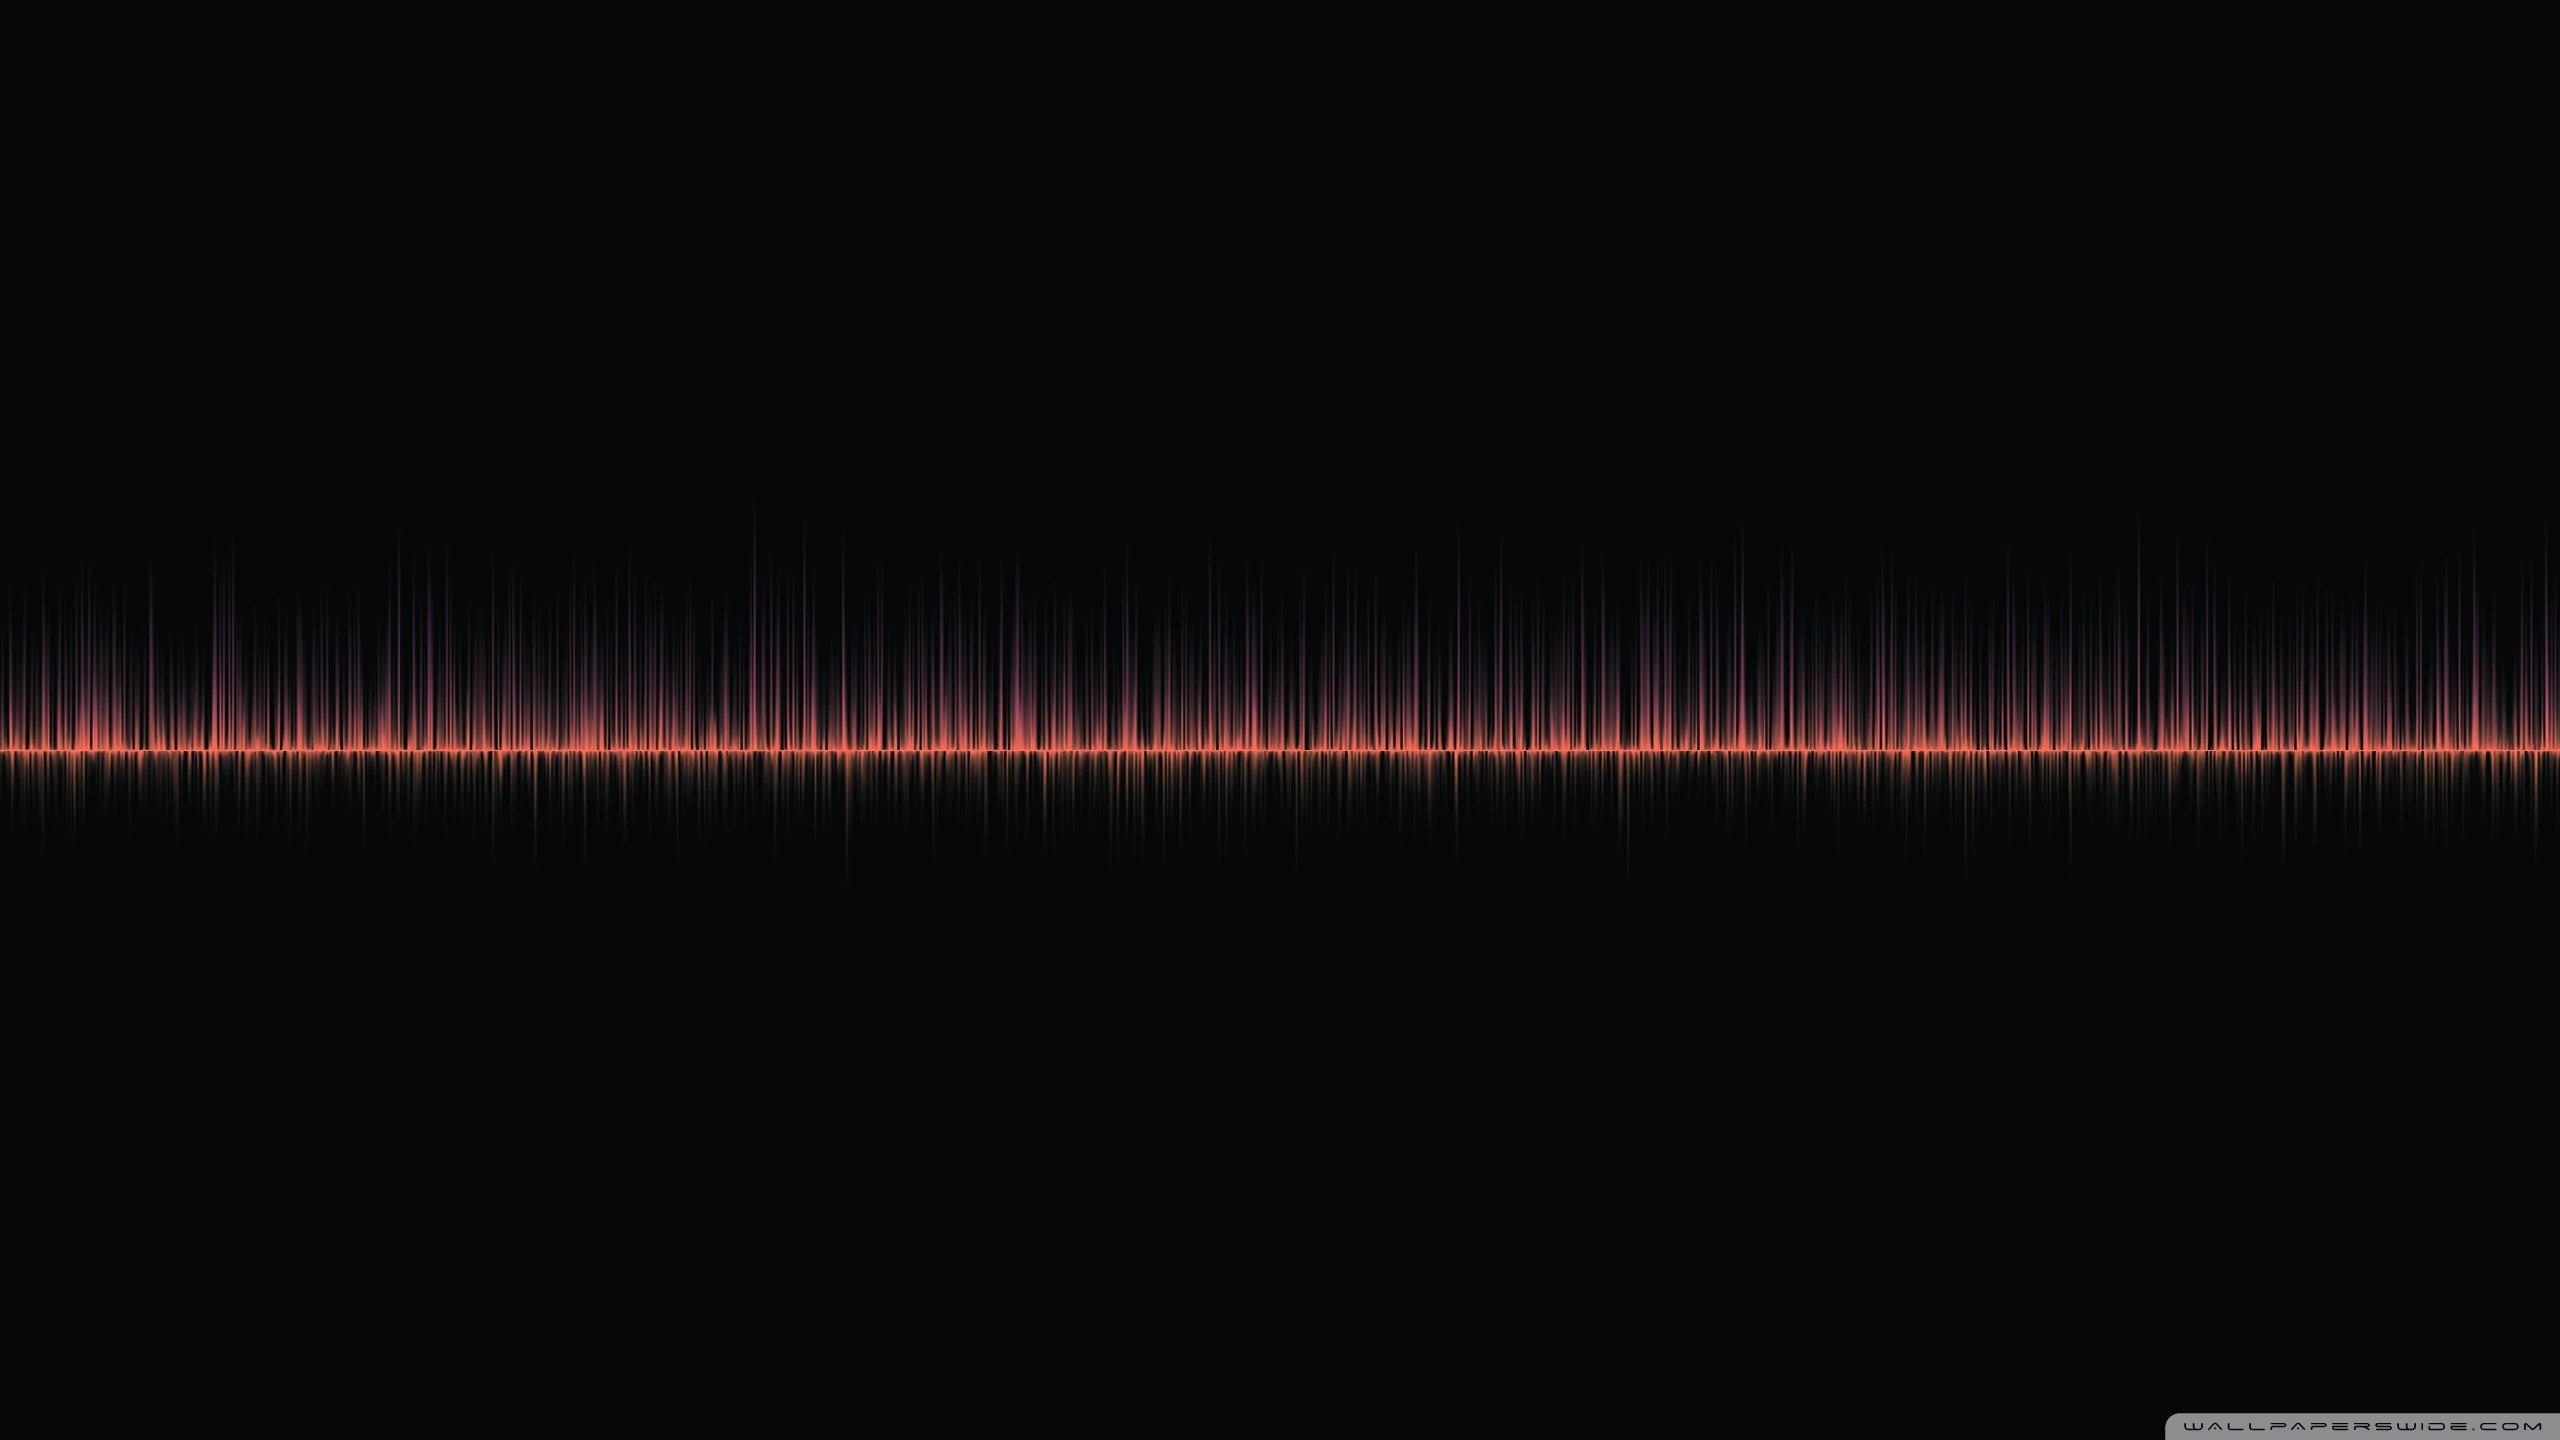 sound waves 3 wallpaper 2560x1440 wallpaper background 2560x1440